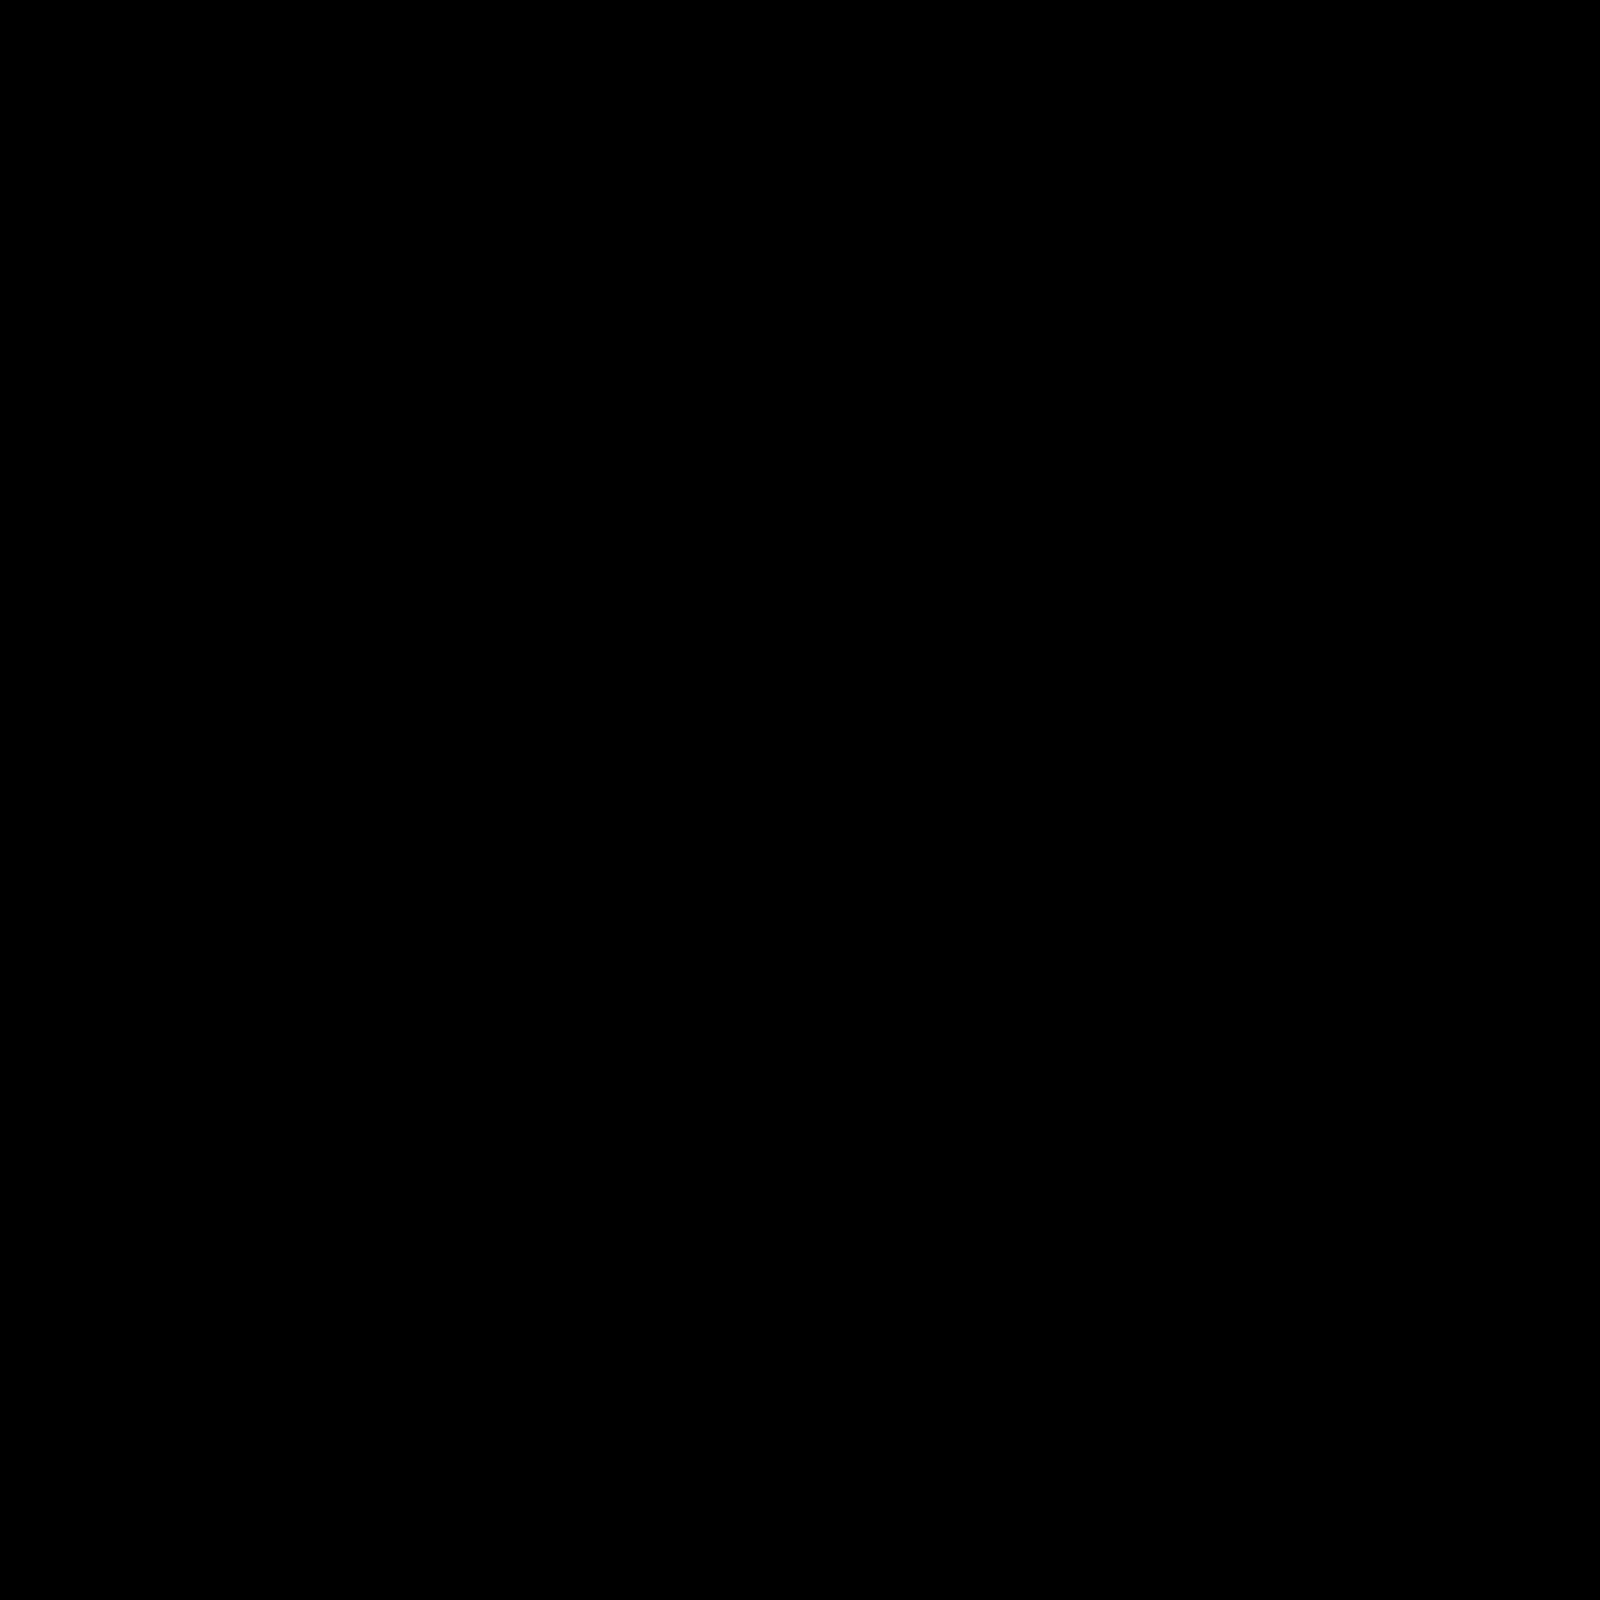 Folder icon - Folder PNG